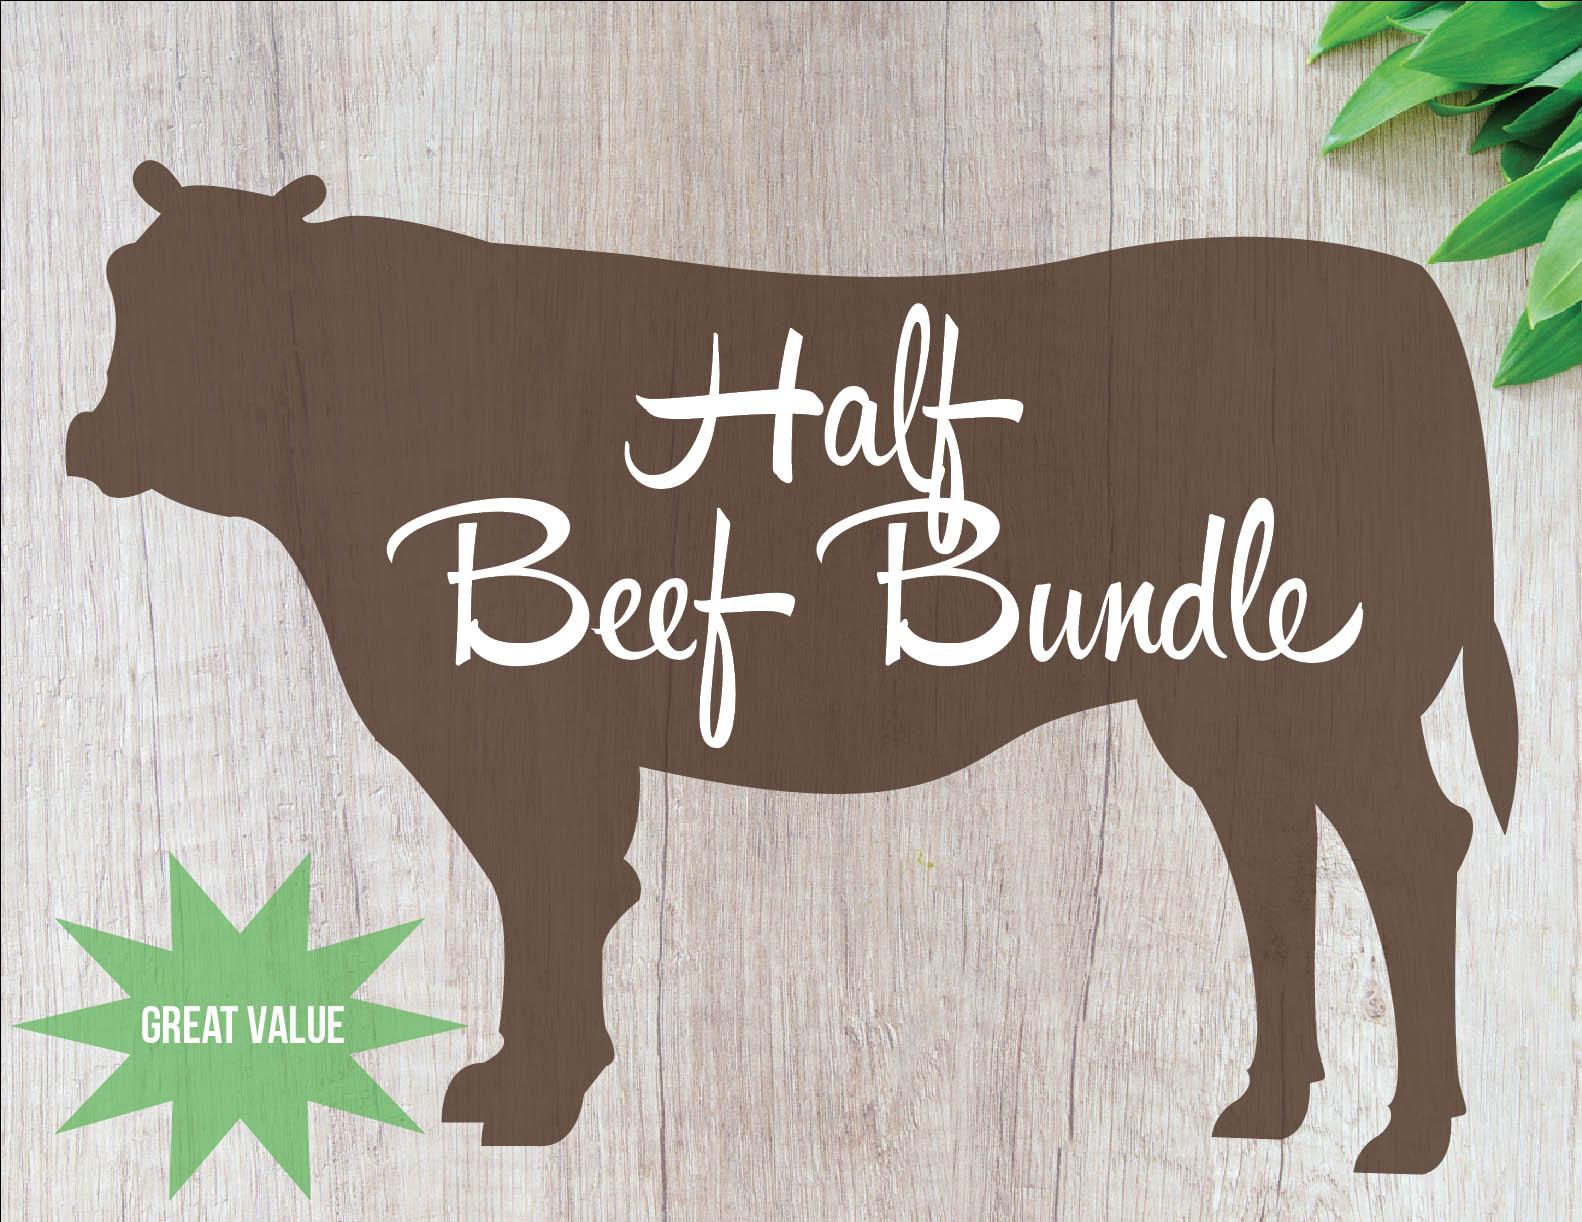 Beef, Deposit, Half, March 28